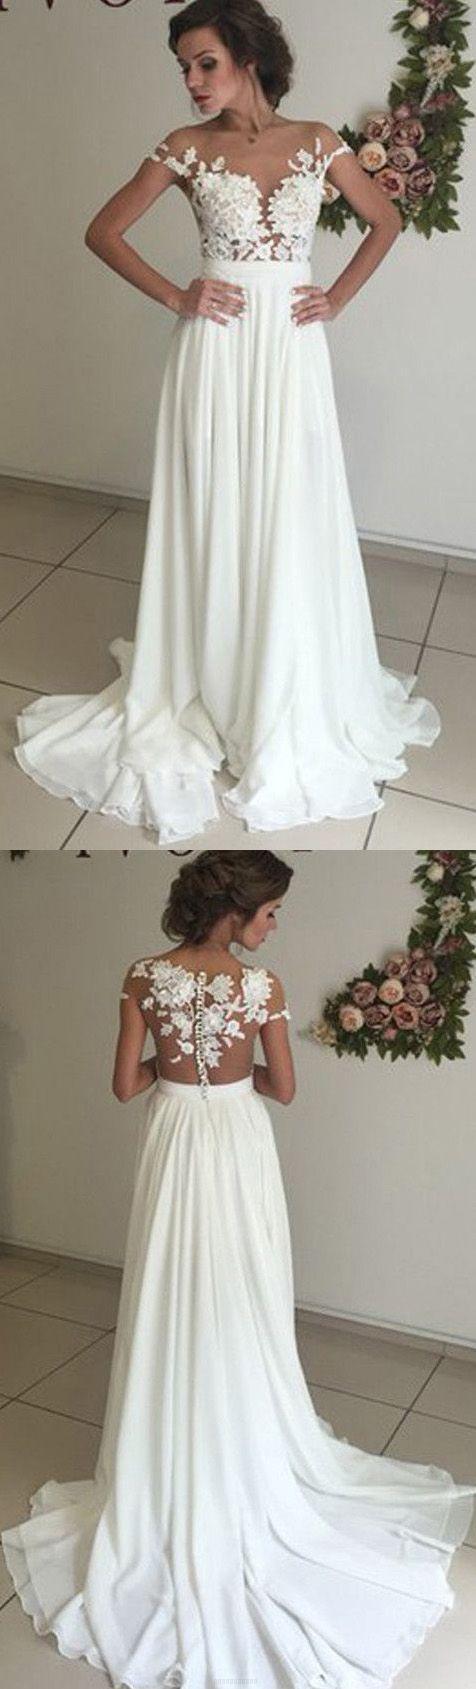 Long alineprincess wedding dresses ivory cap sleeve with applique